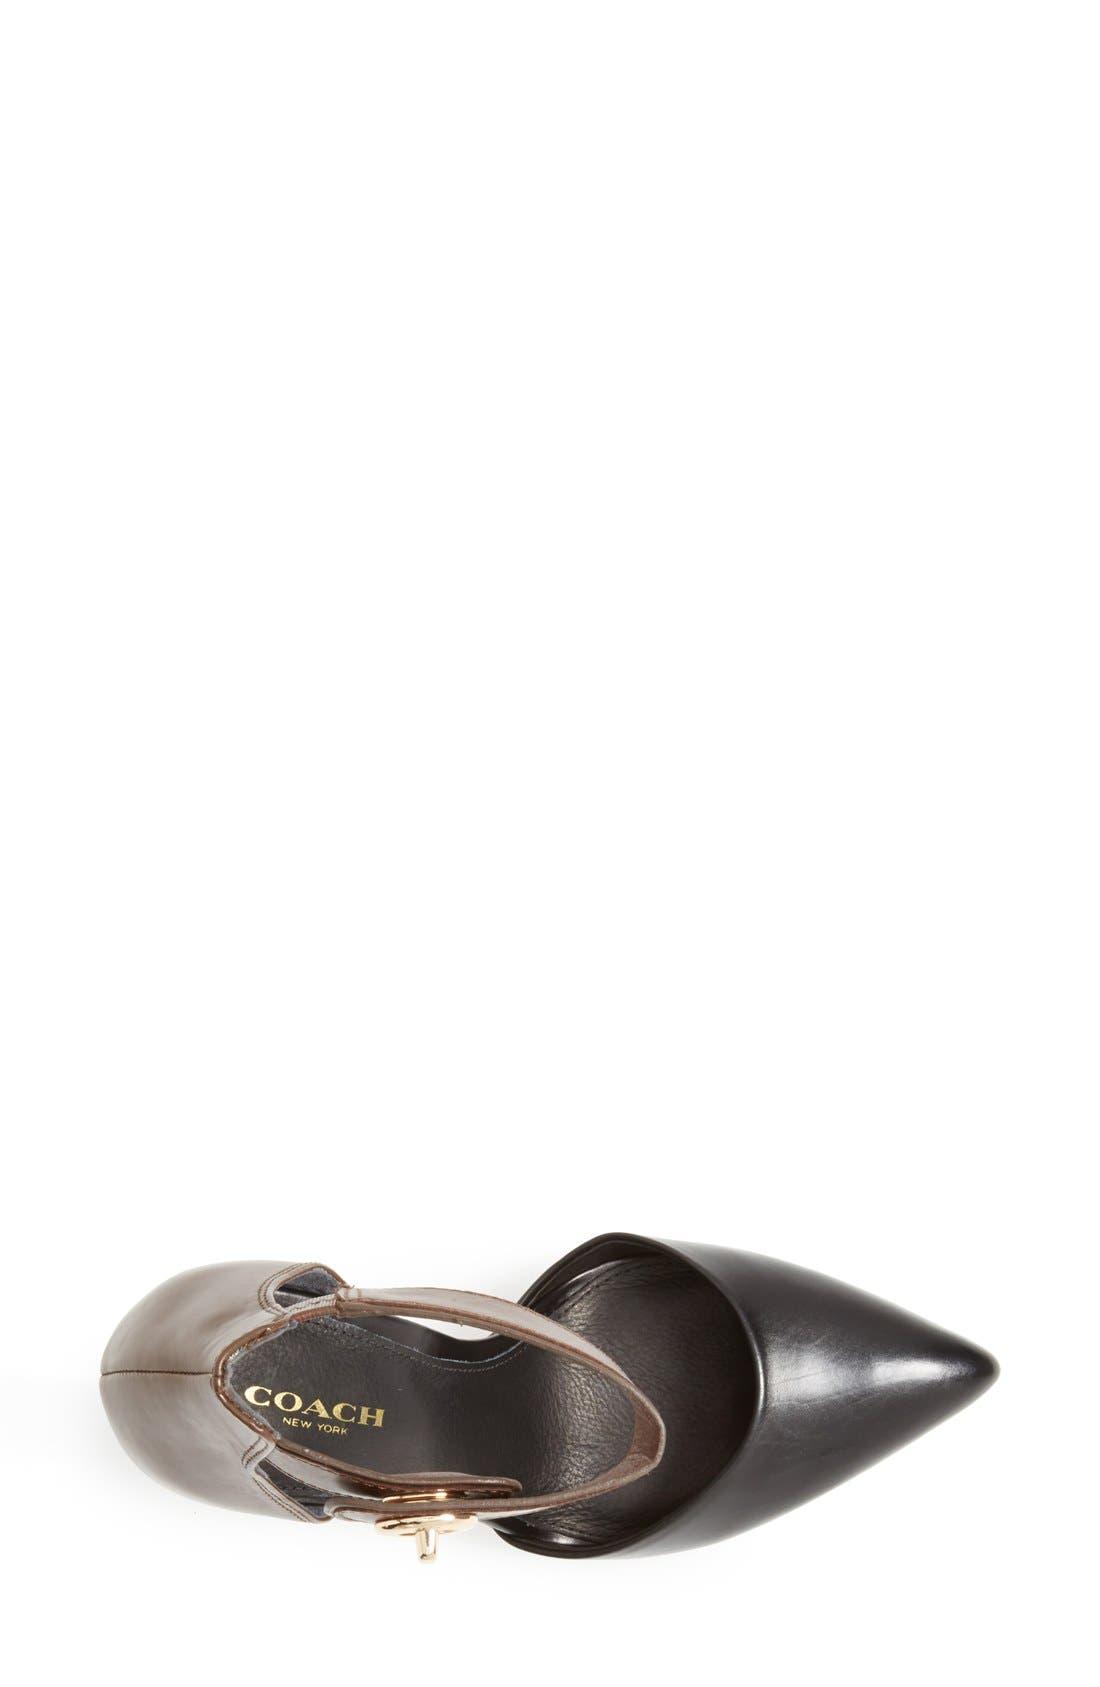 Alternate Image 3  - COACH 'Houston' Two-Tone Leather Ankle Strap Pump (Women)